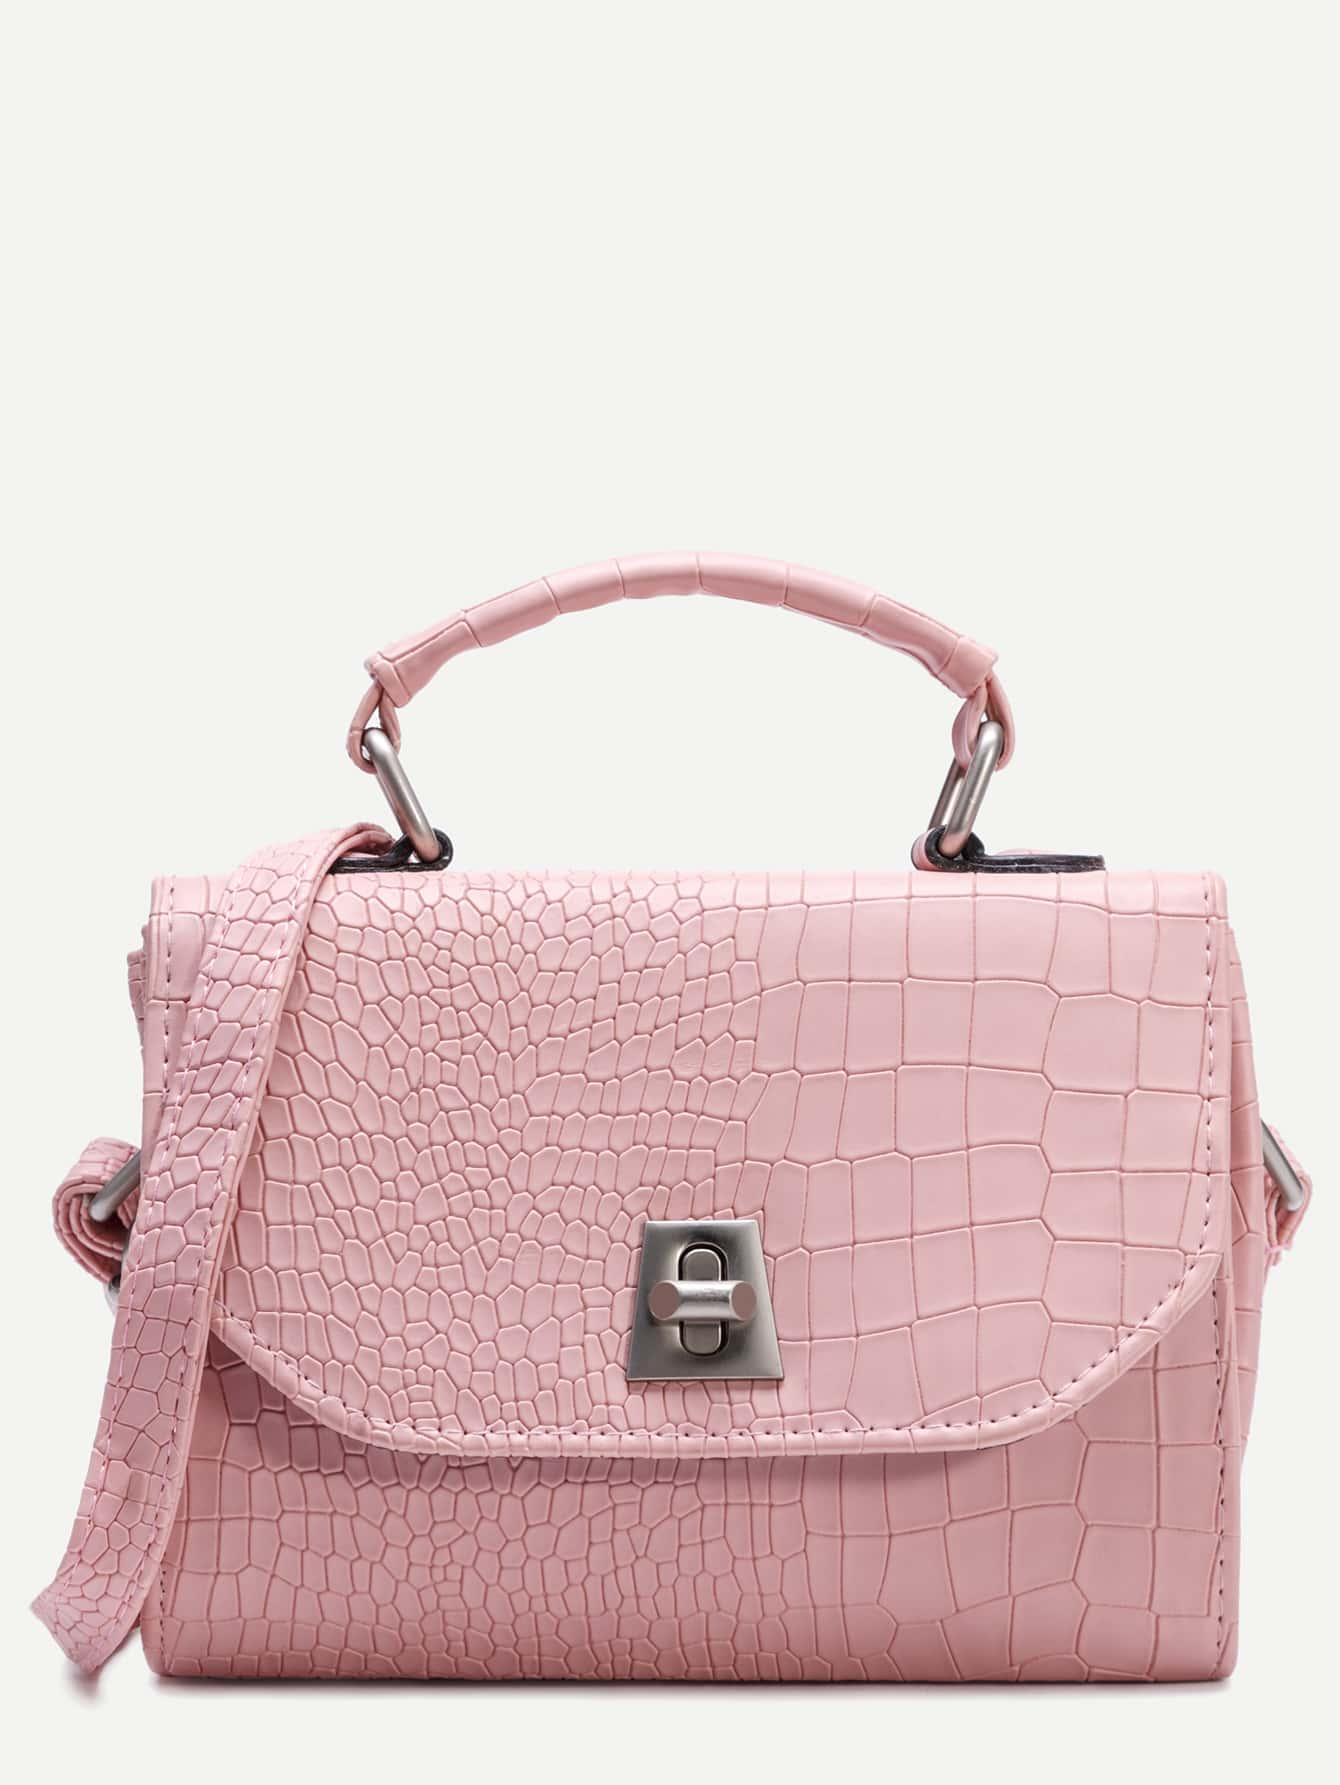 bag160830916_2